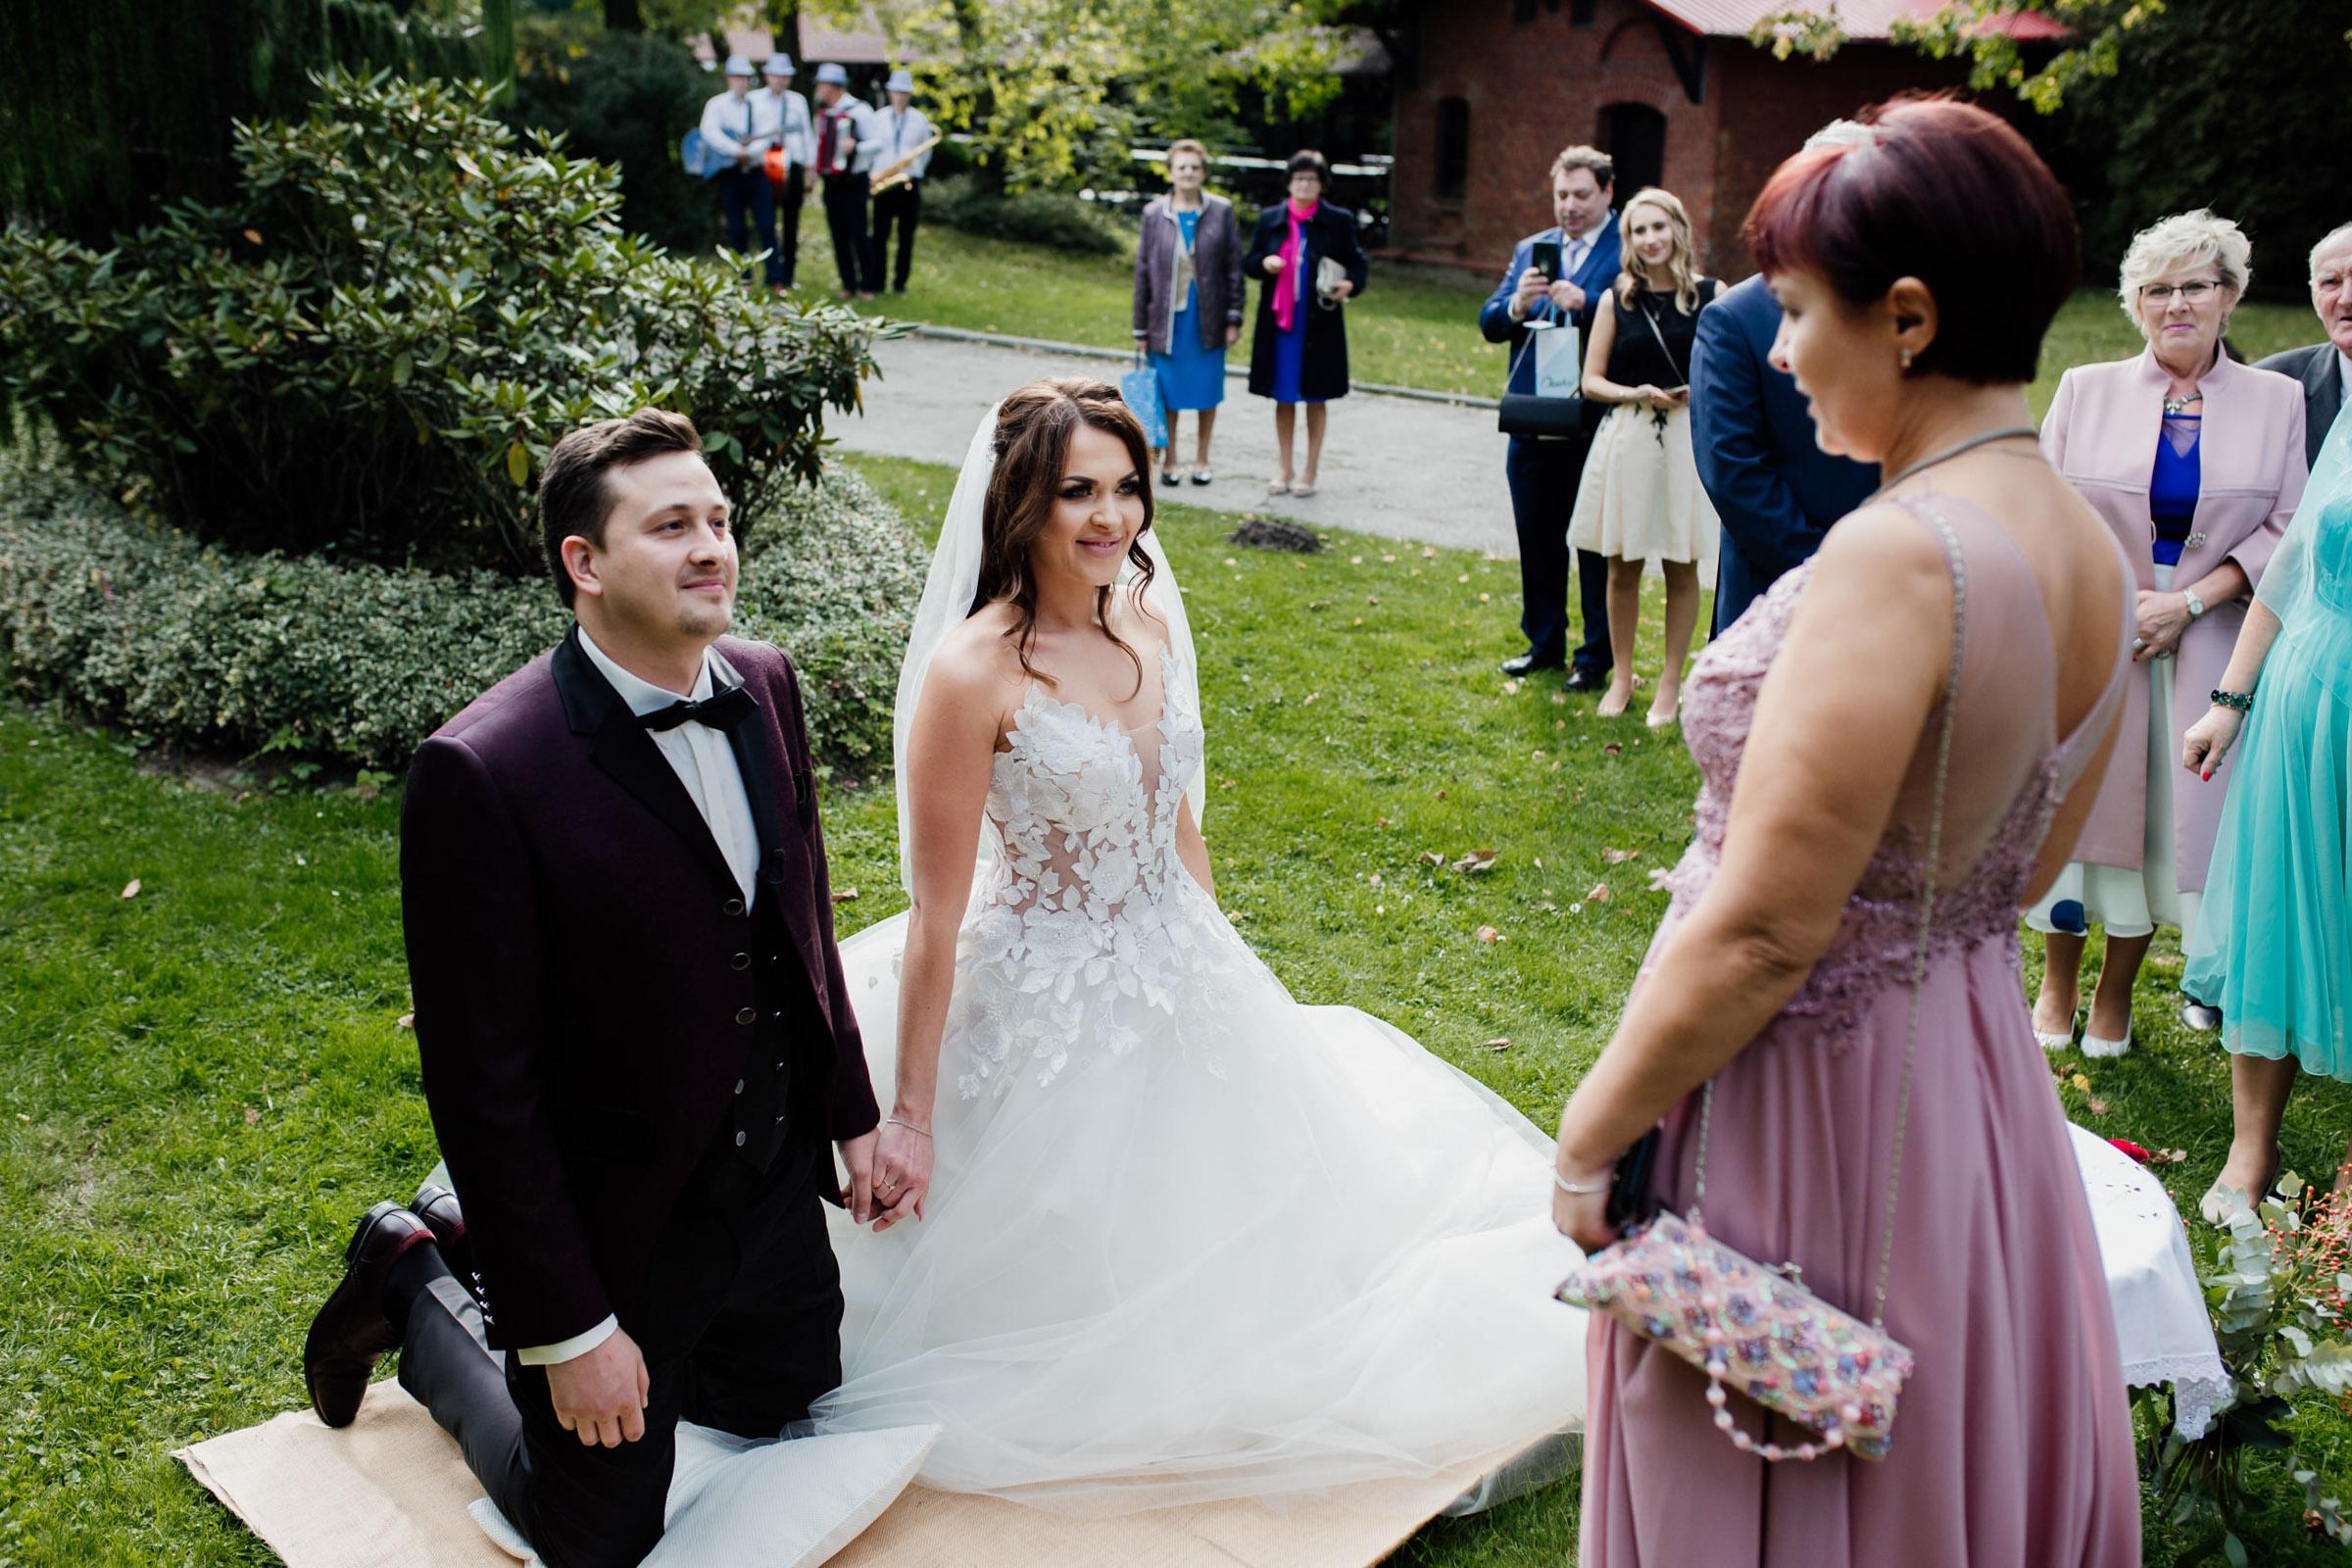 wesele w folwarku plener